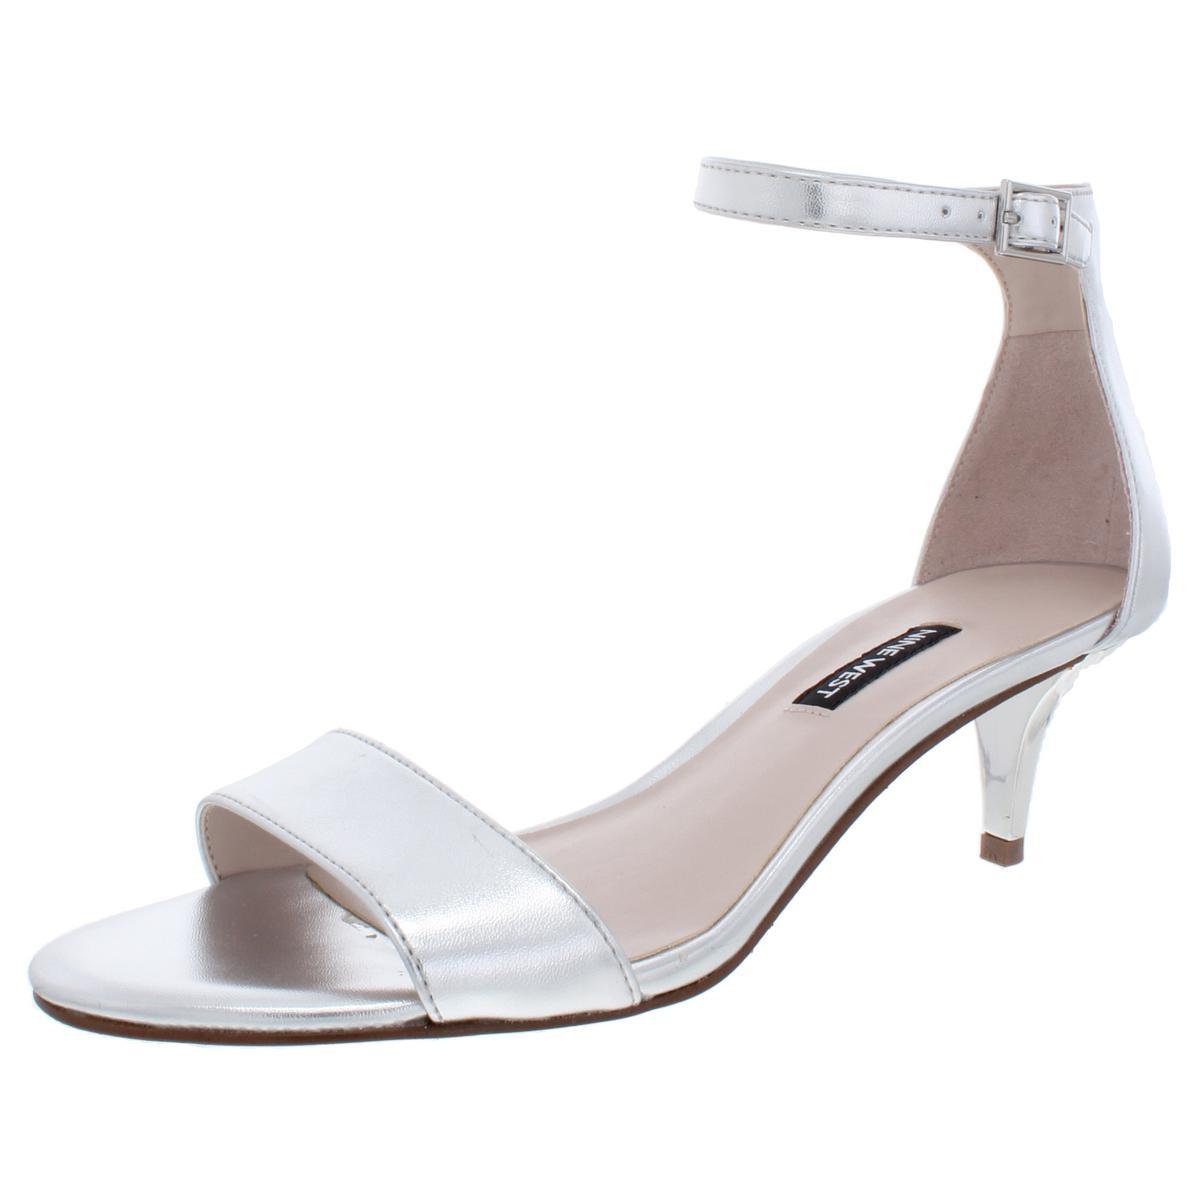 Nine West Womens Leisa Mixed Media Kitten Evening Sandals Shoes BHFO 0077